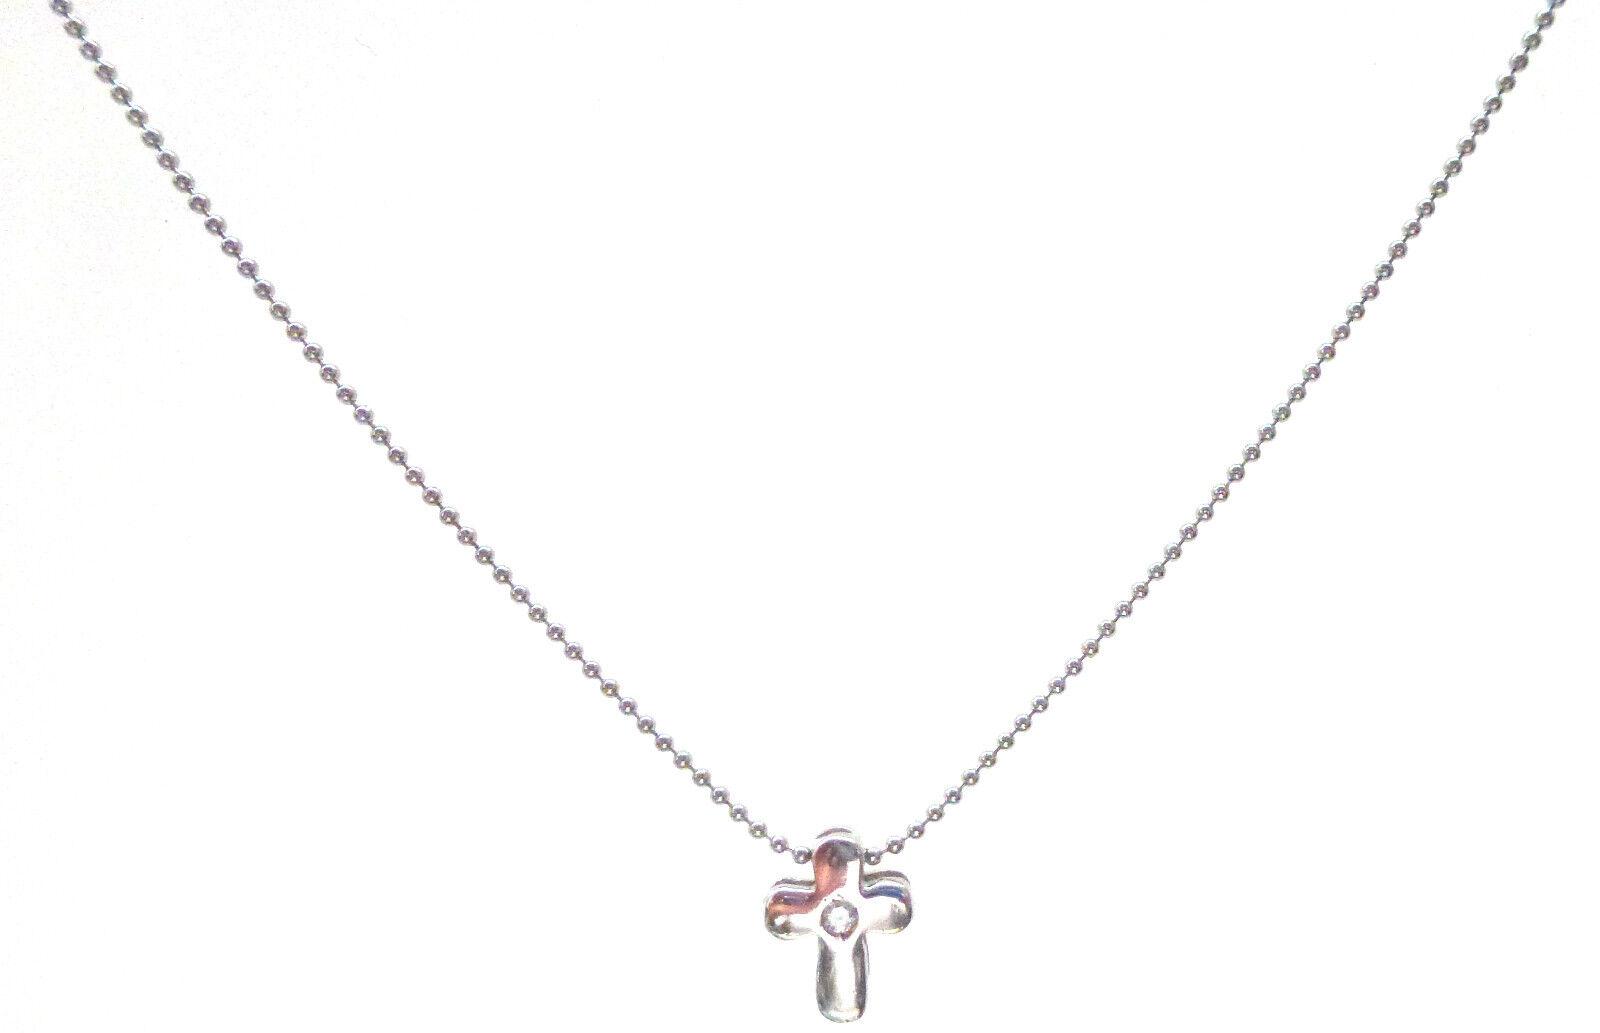 9ct  White gold Bead Chain with Diamond Set  Cross